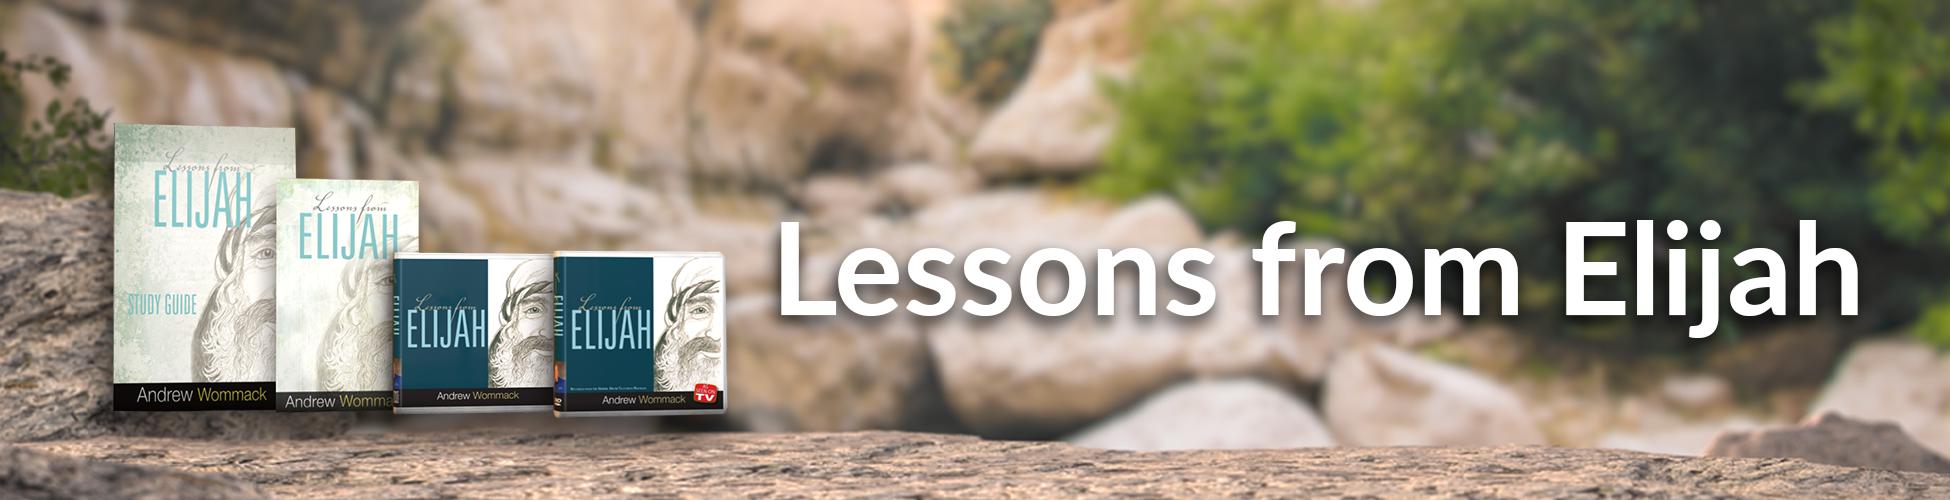 Lessons-from-elijah-website-banner-1950x500-2